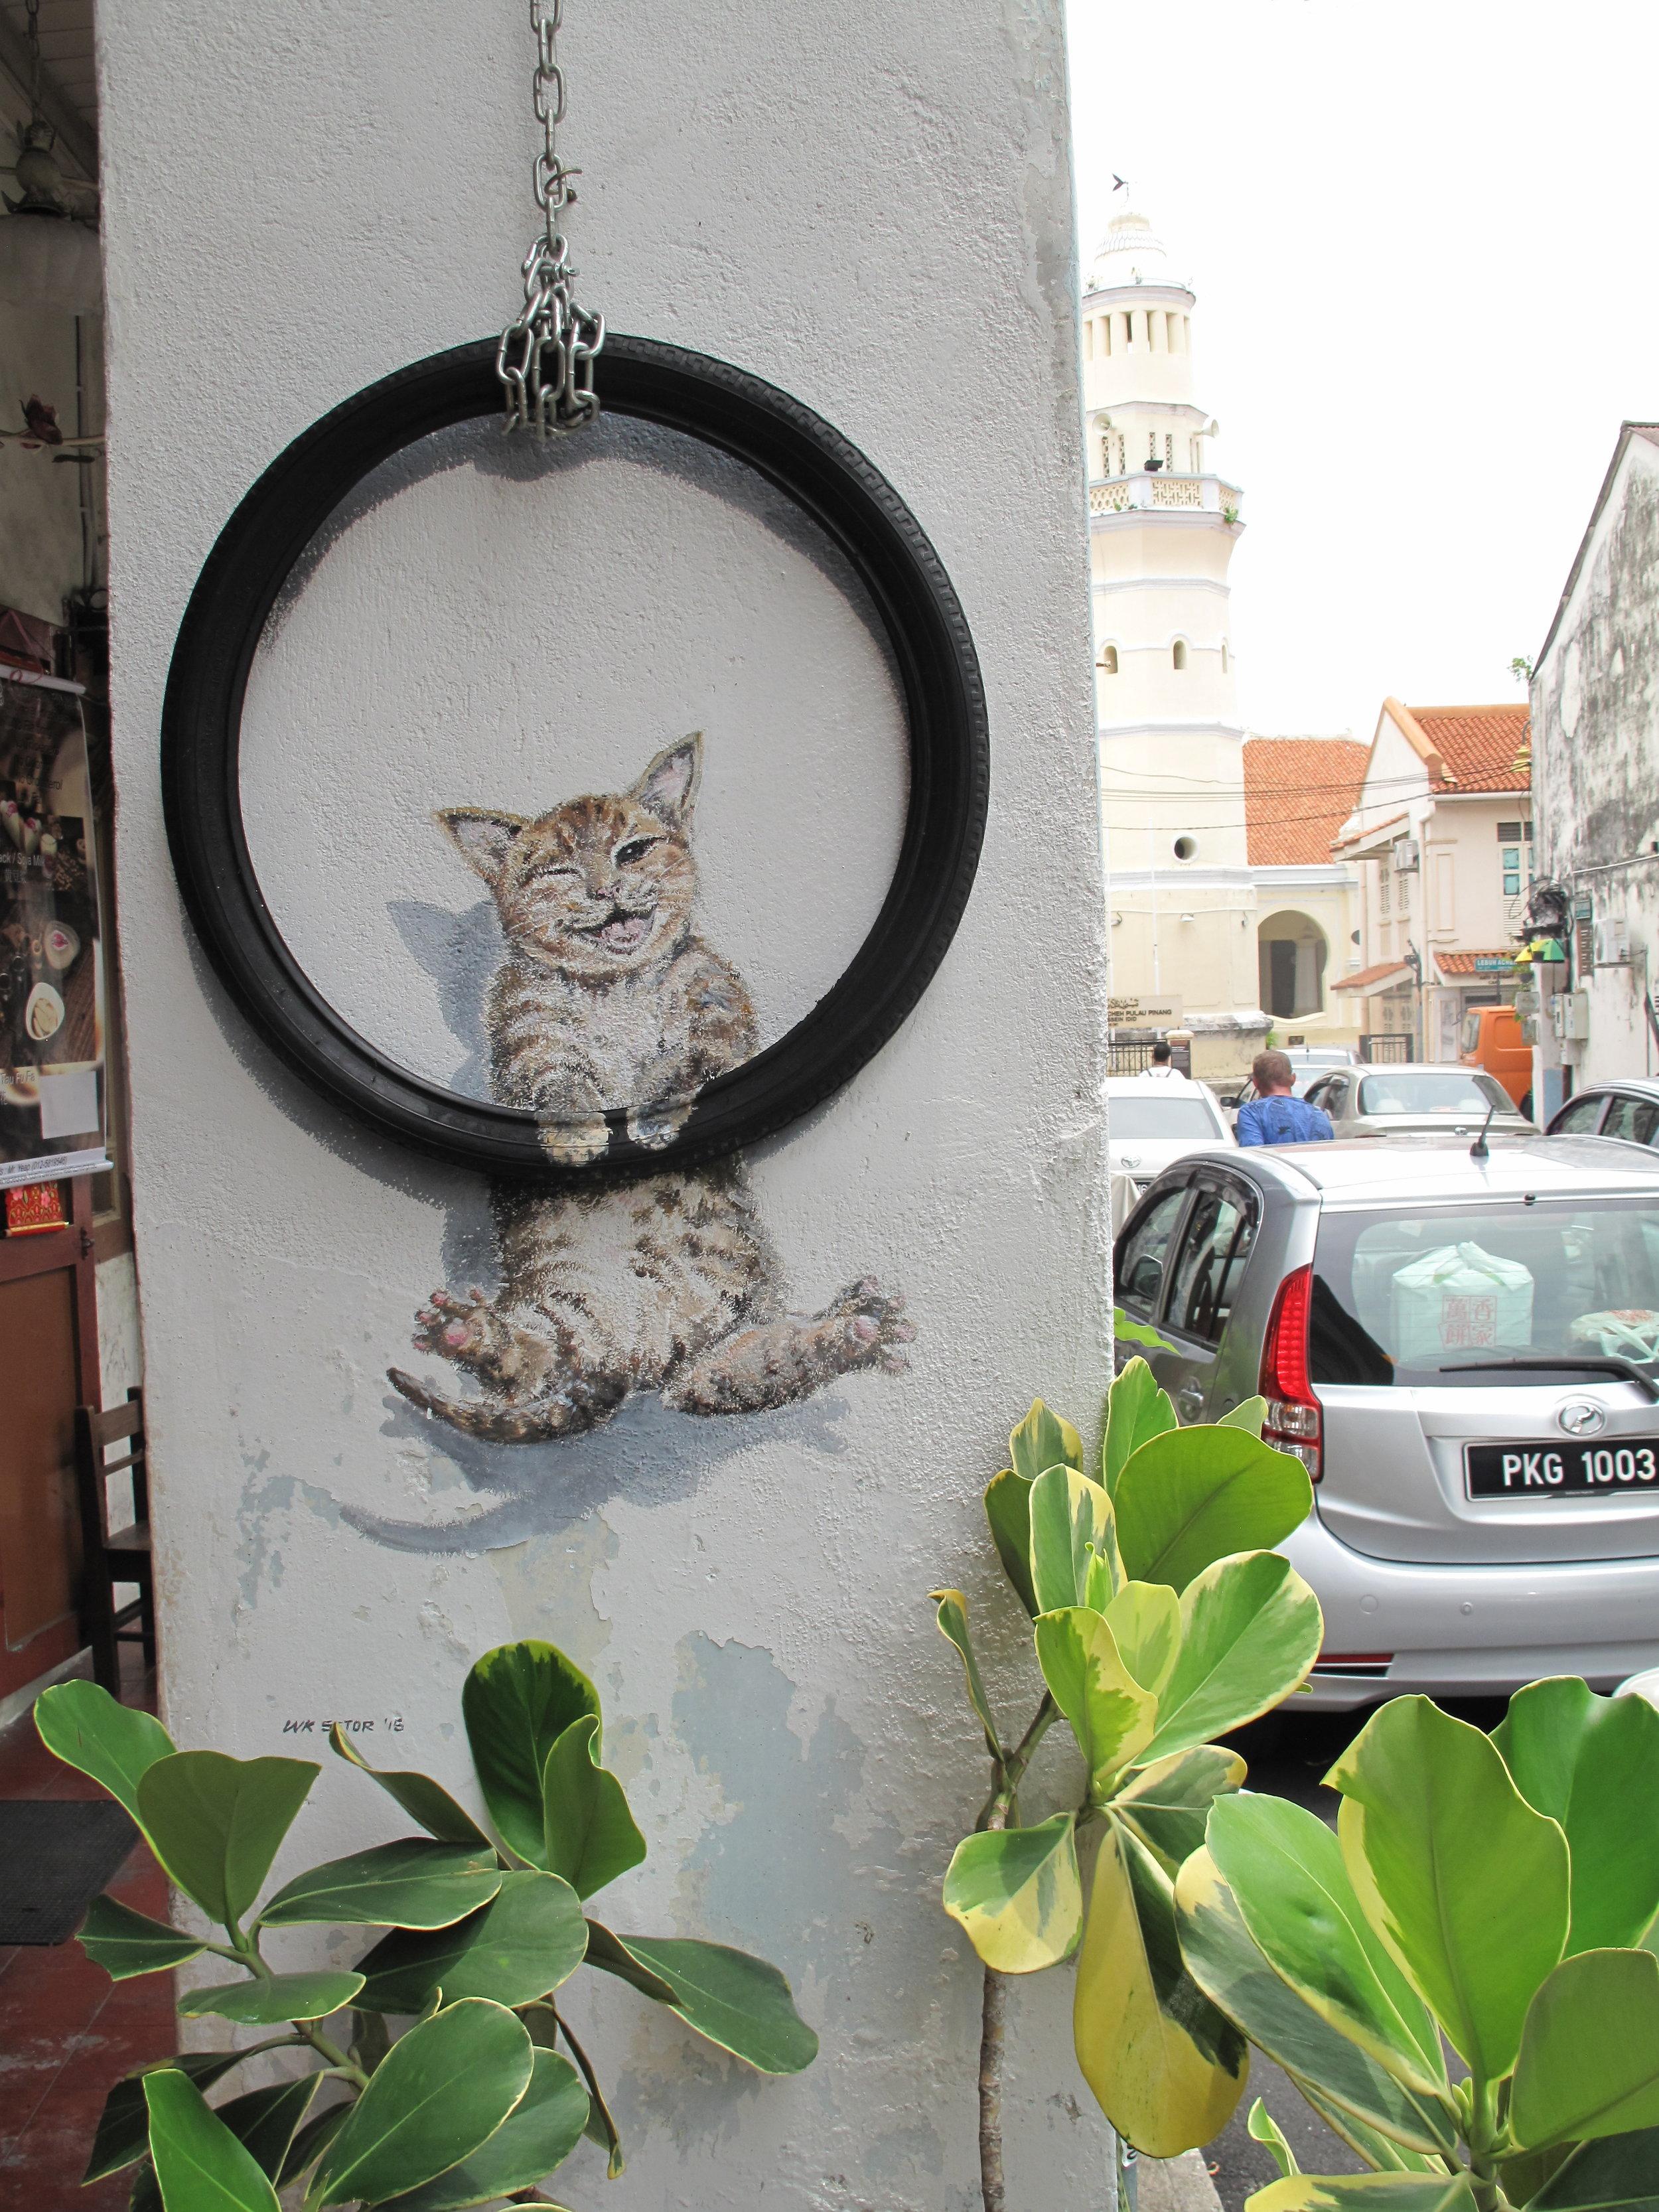 Street Art, Georgetown, Penang, Malaysia